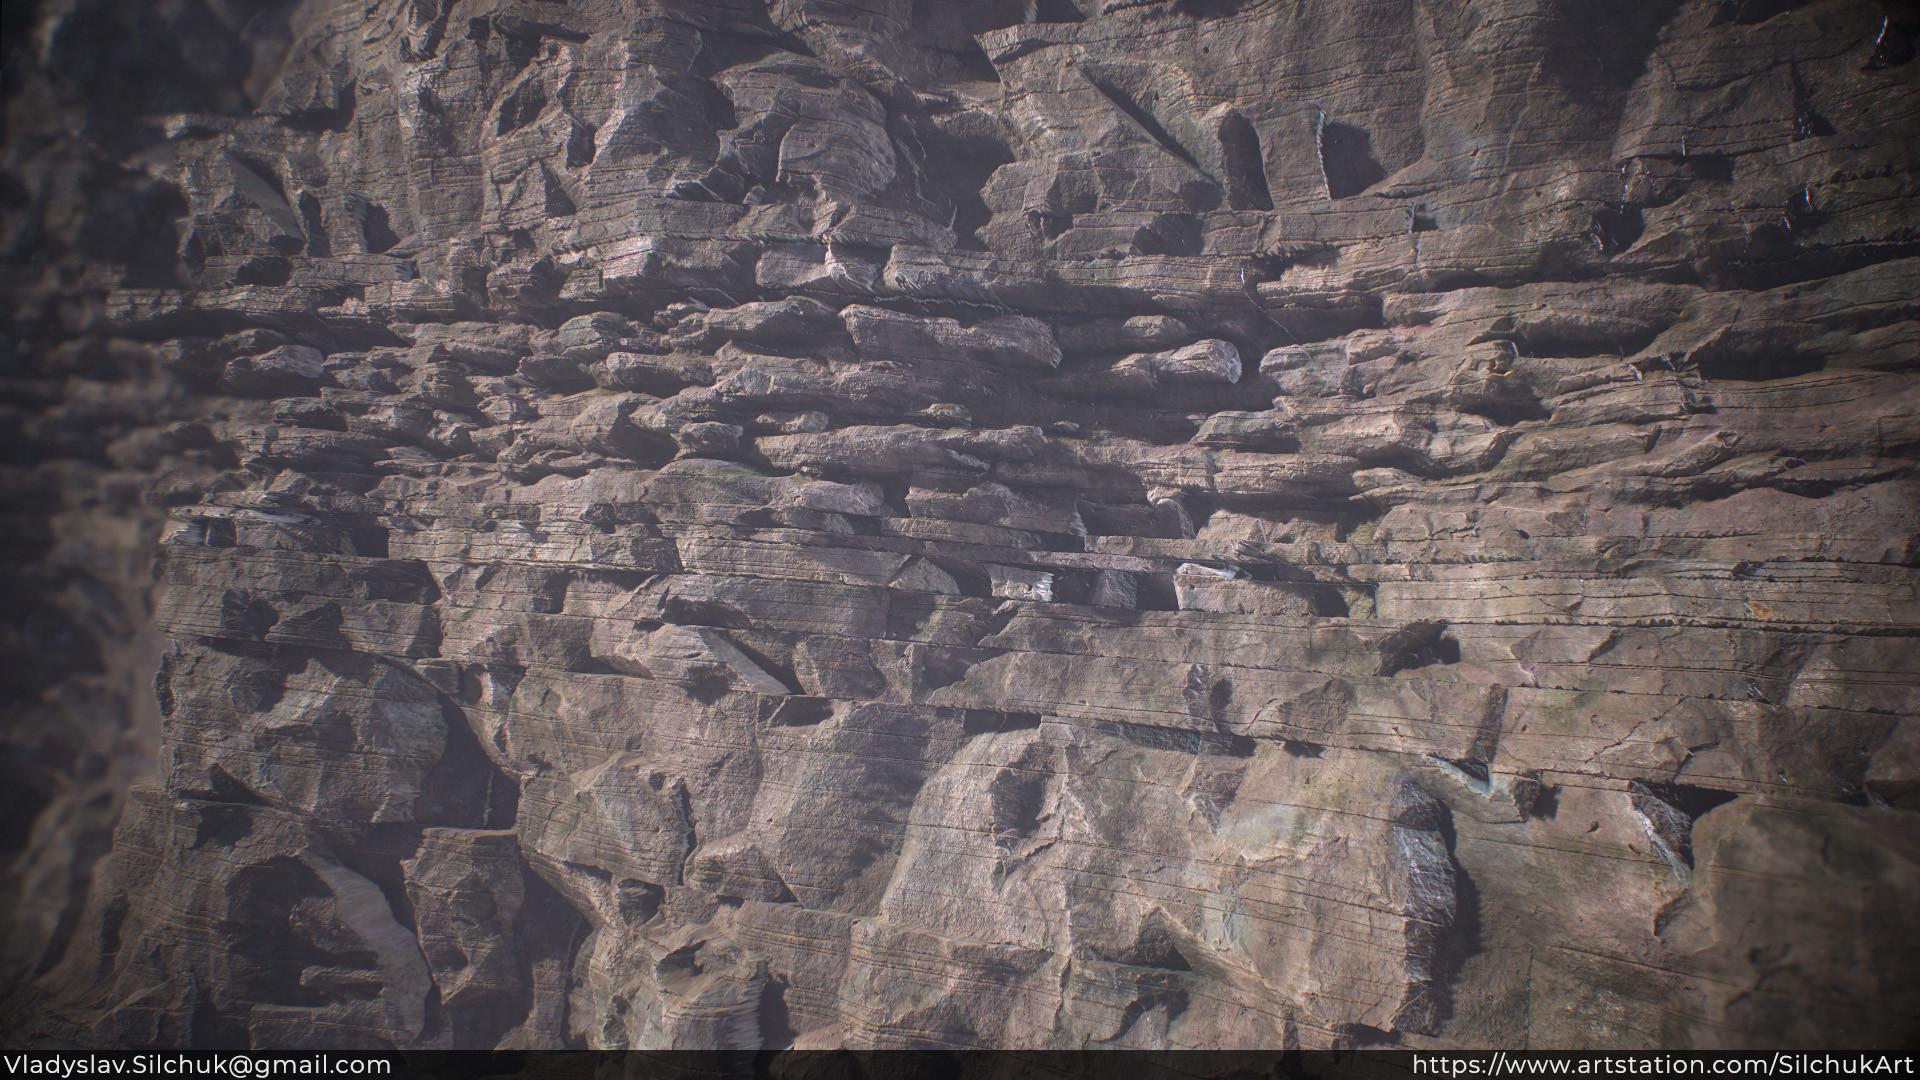 Vladyslav silchuk layered cliff 10